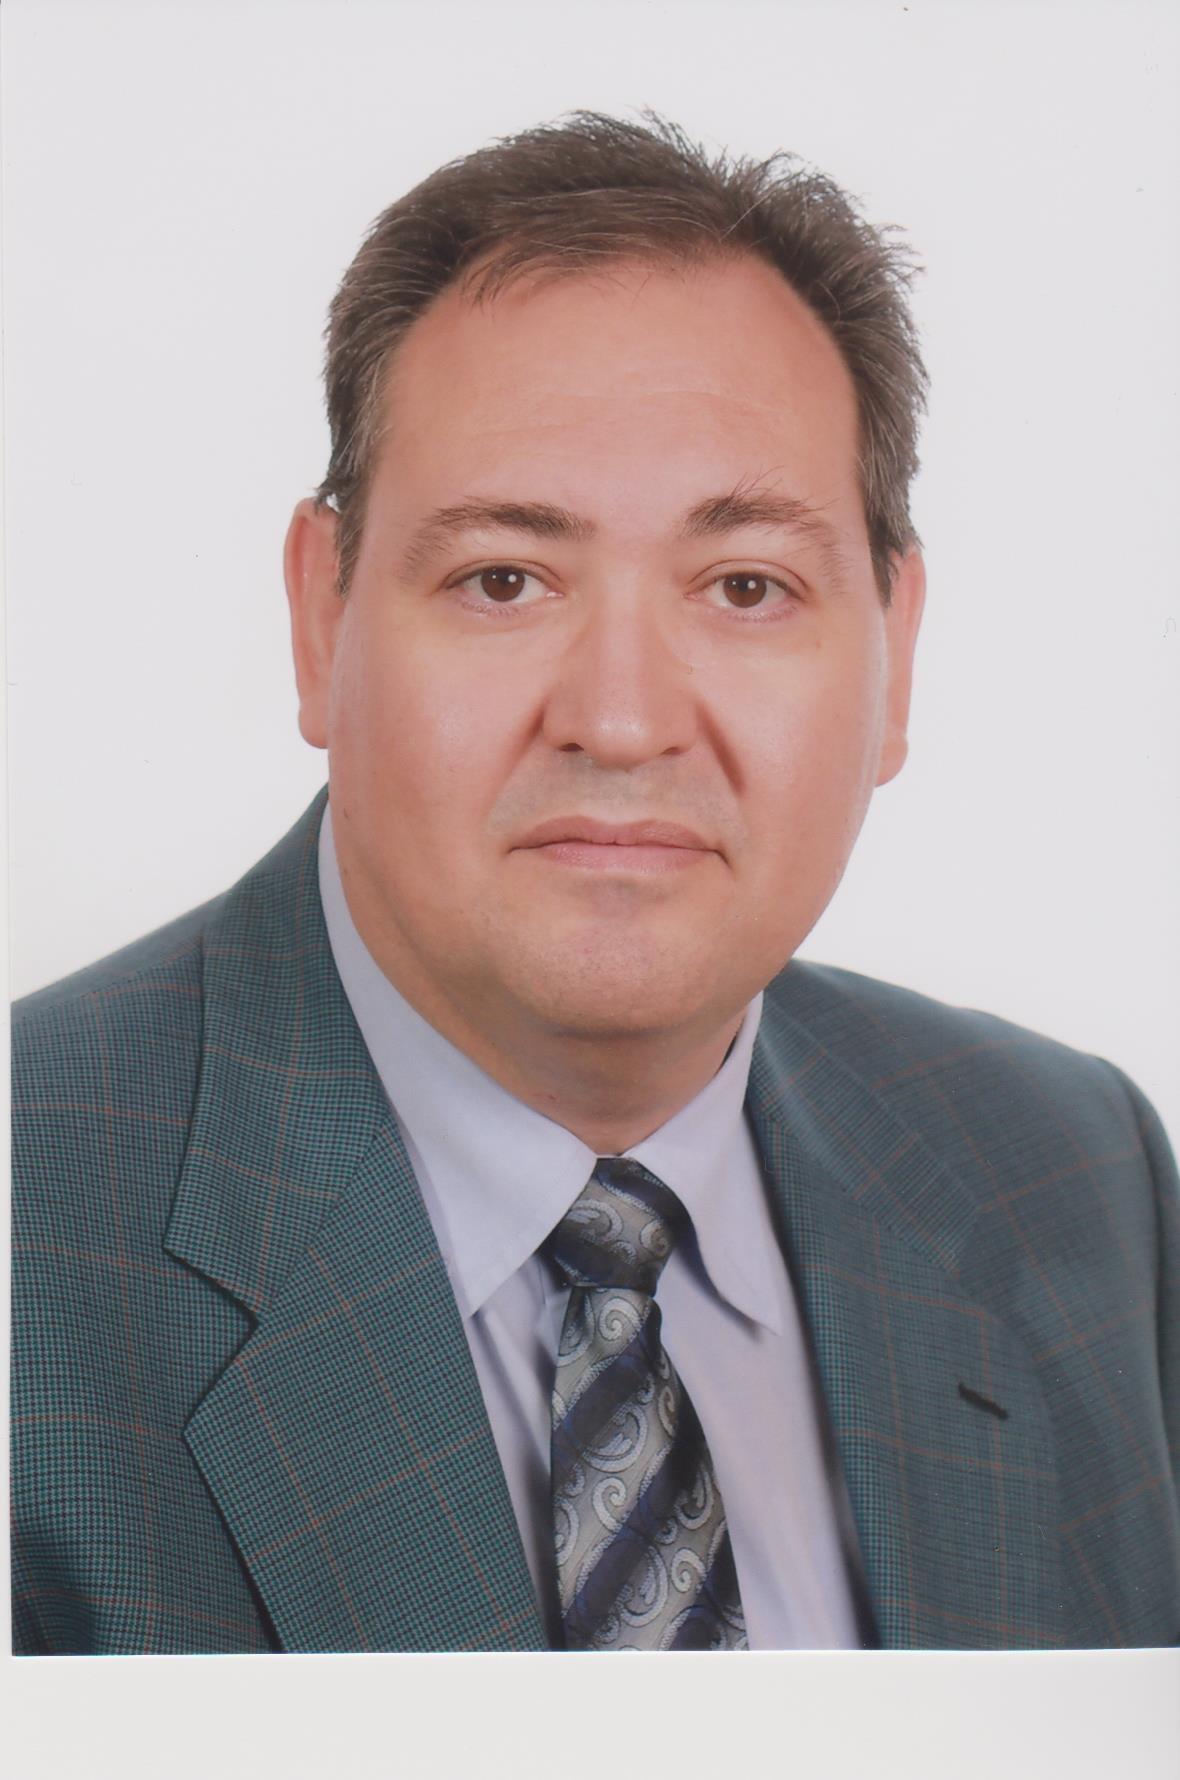 Dott. Stefano Papandrea